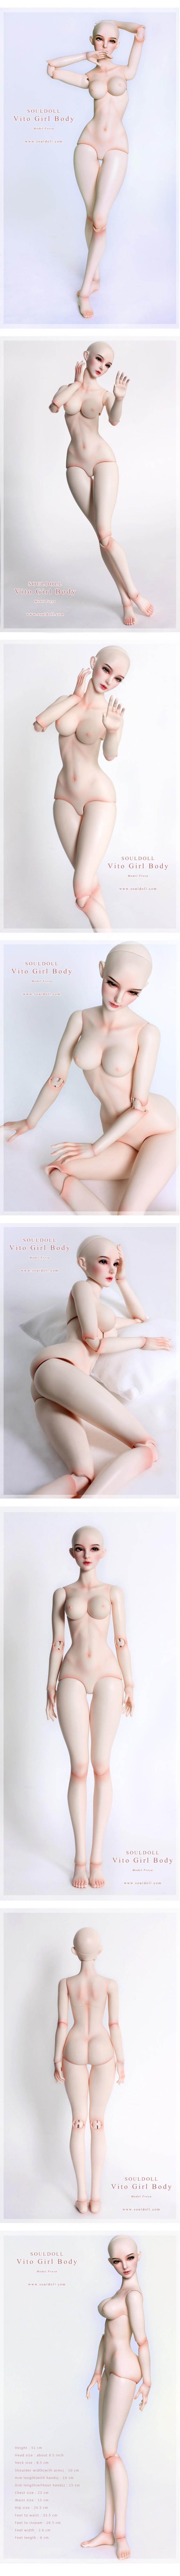 soul_body_vitog_02.jpg